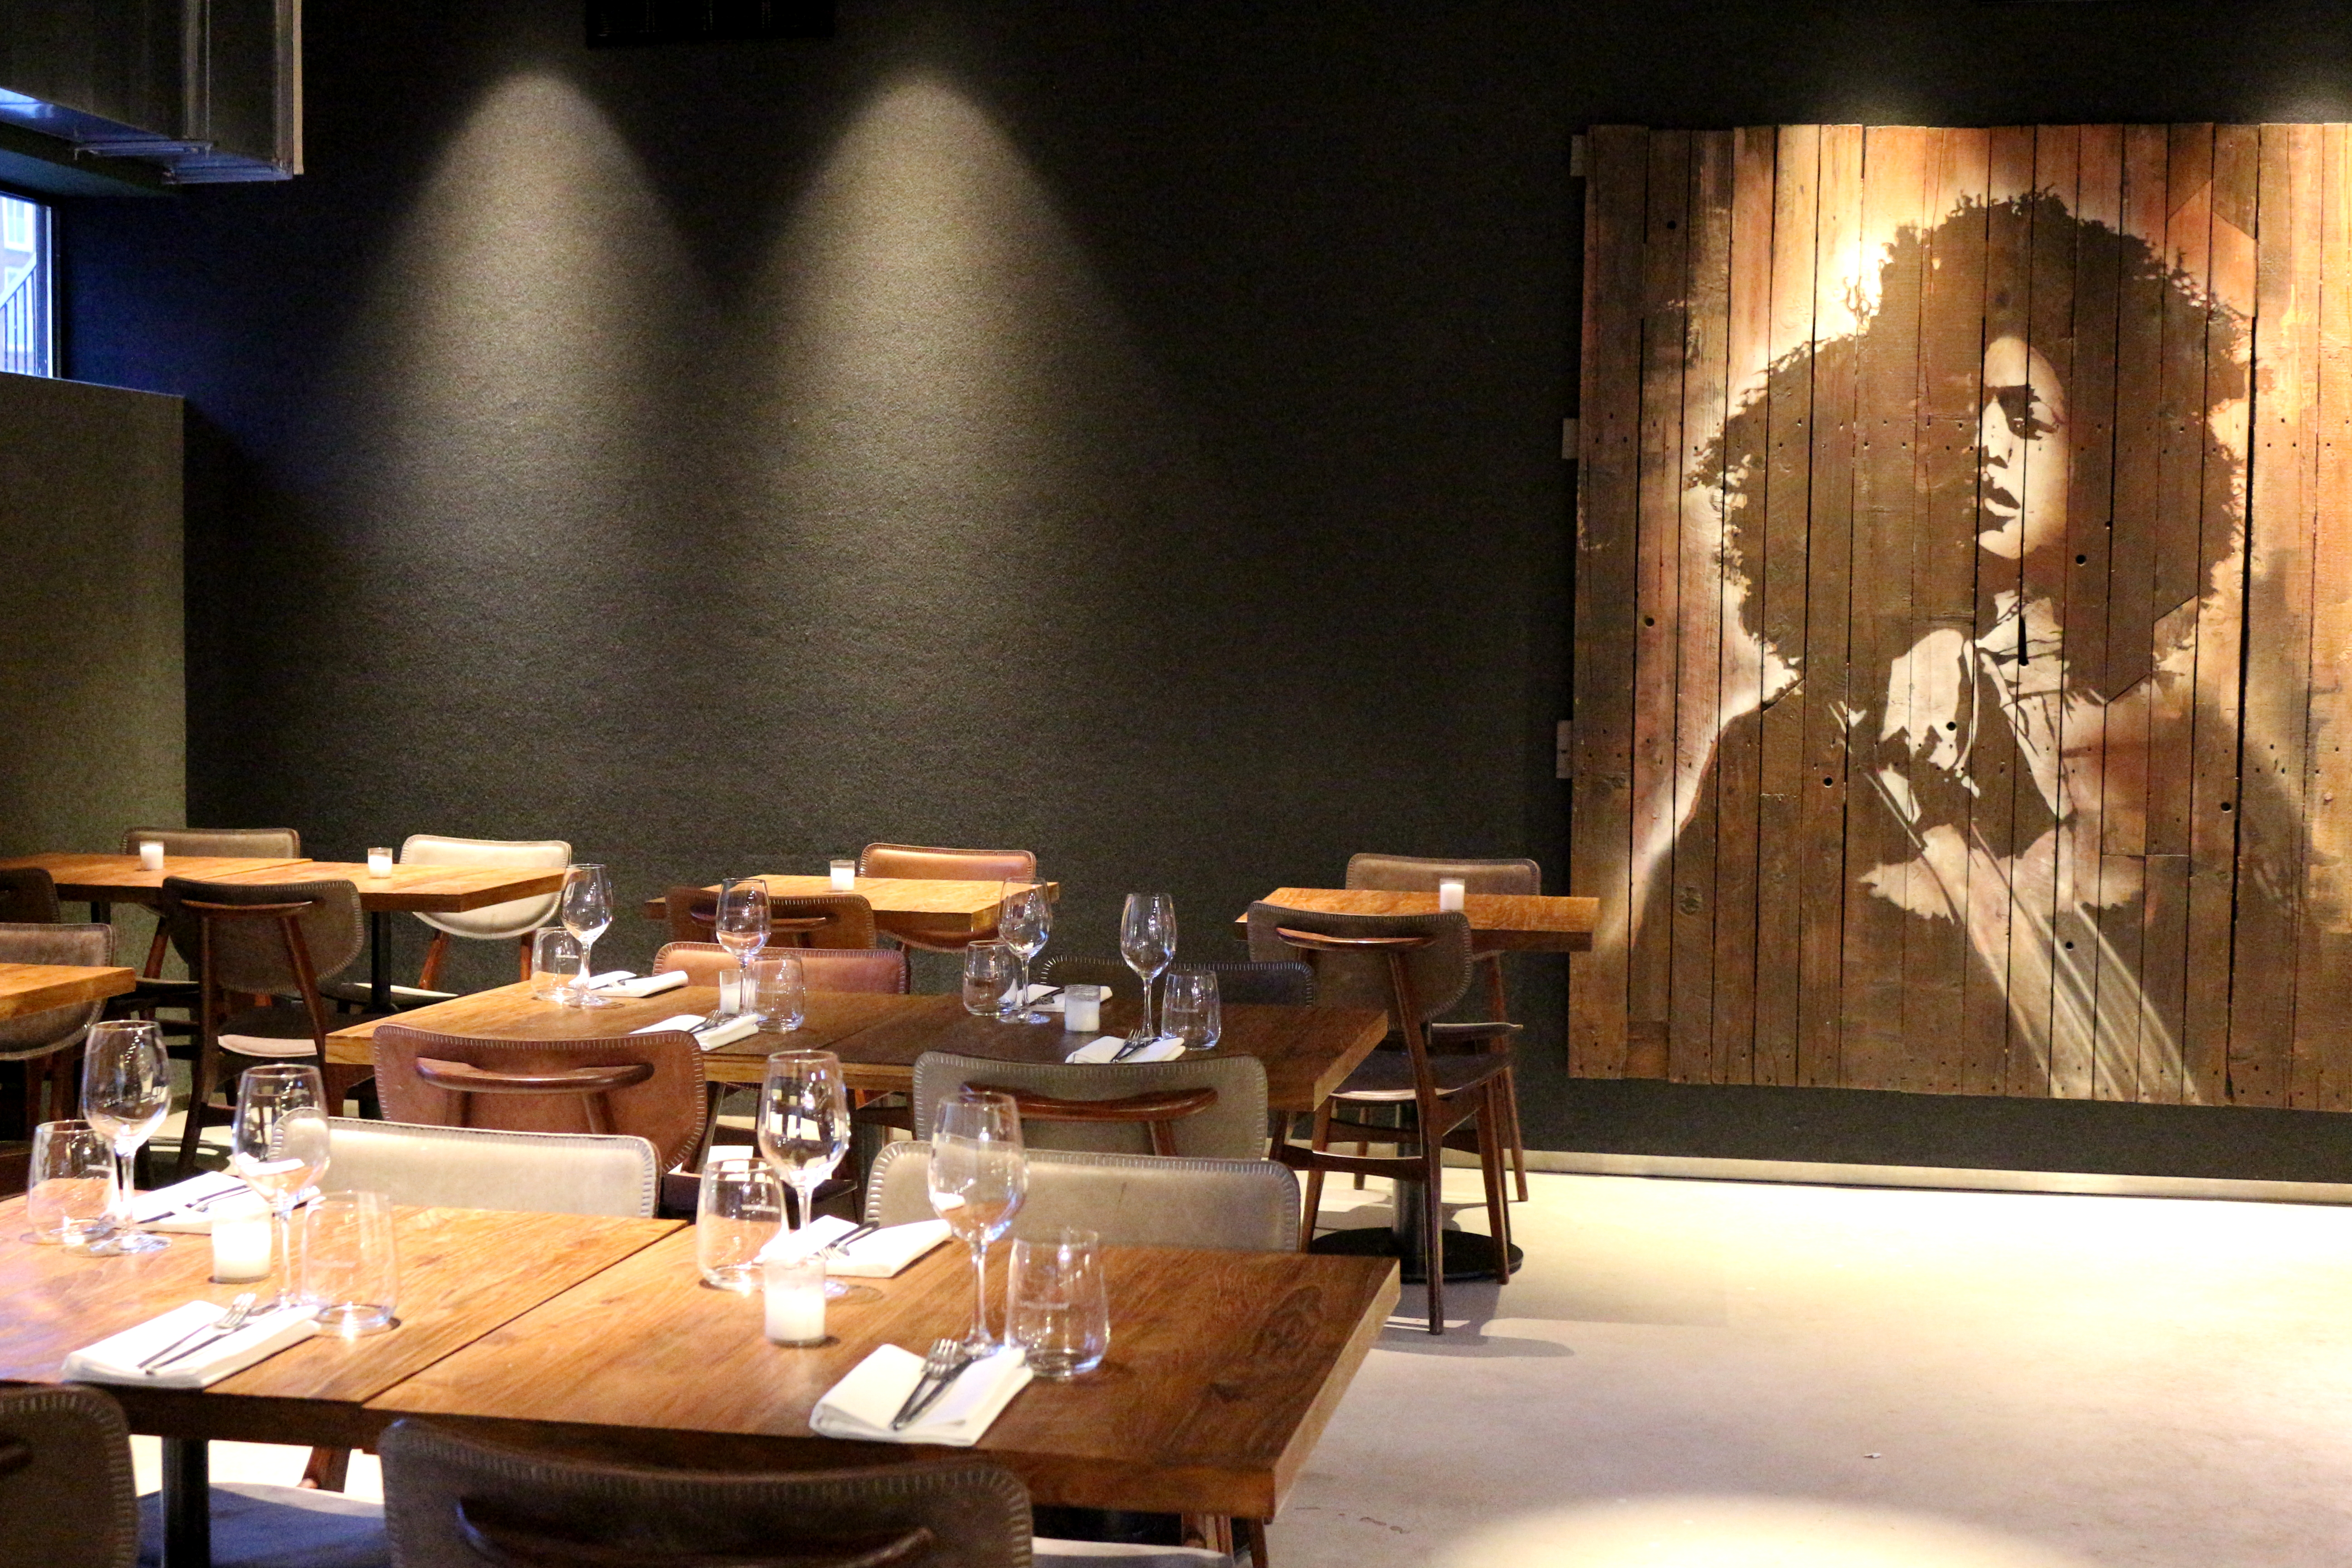 awesomeamsterdam_restaurantC5